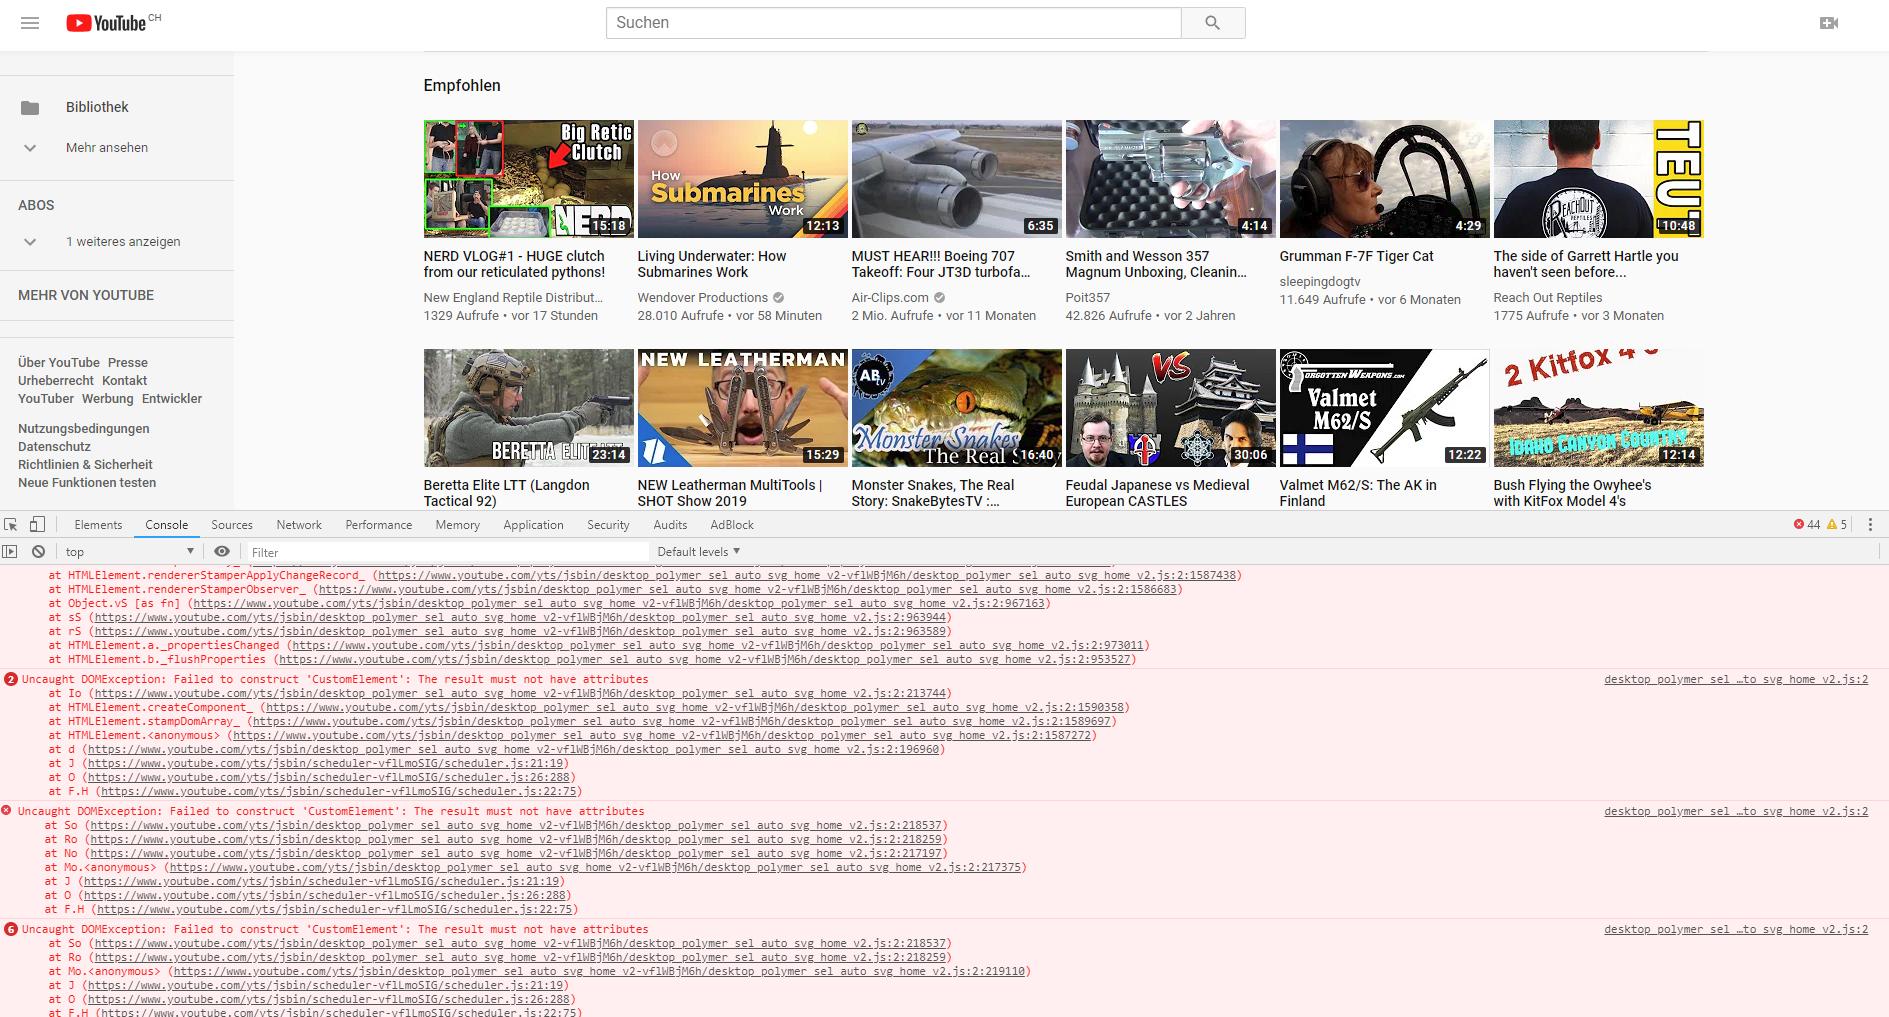 Youtube not working correctly | Vivaldi Forum